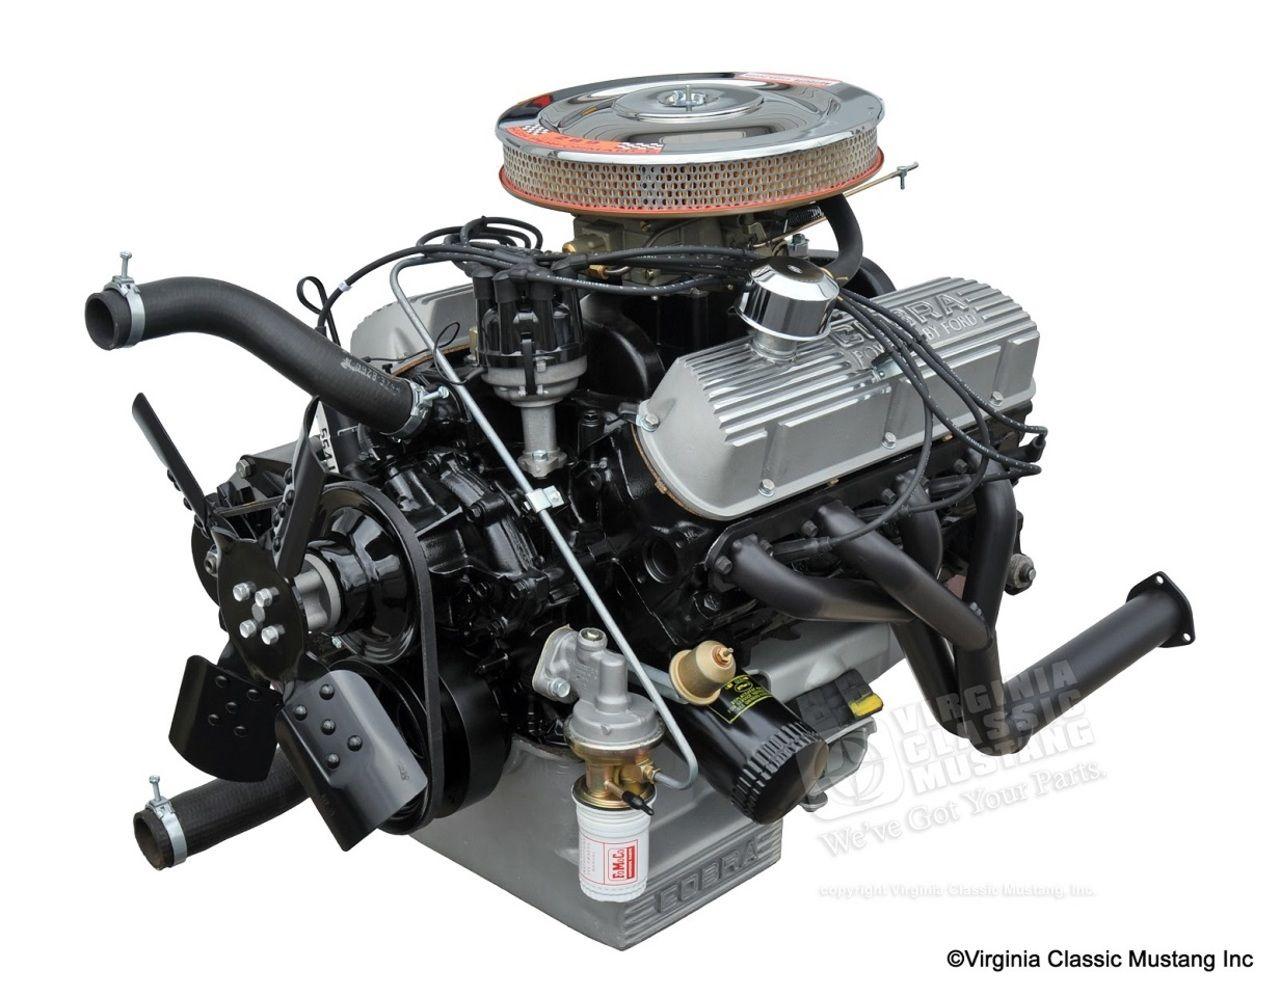 medium resolution of 1965 1966 shelby gt350 engine